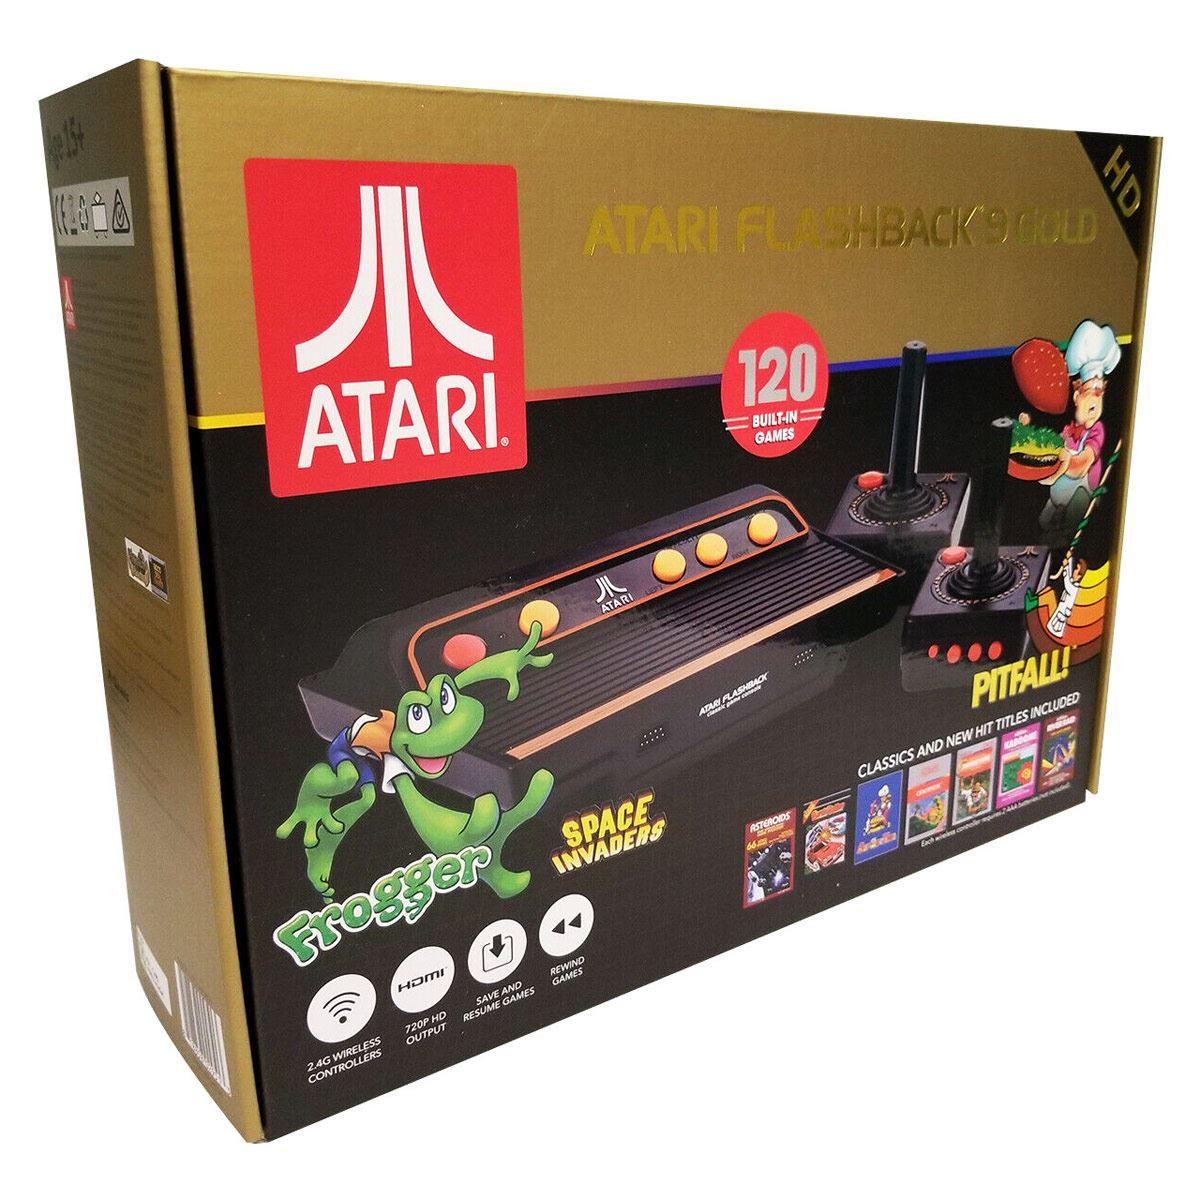 Consola Atari Flashback HD 9 Gold